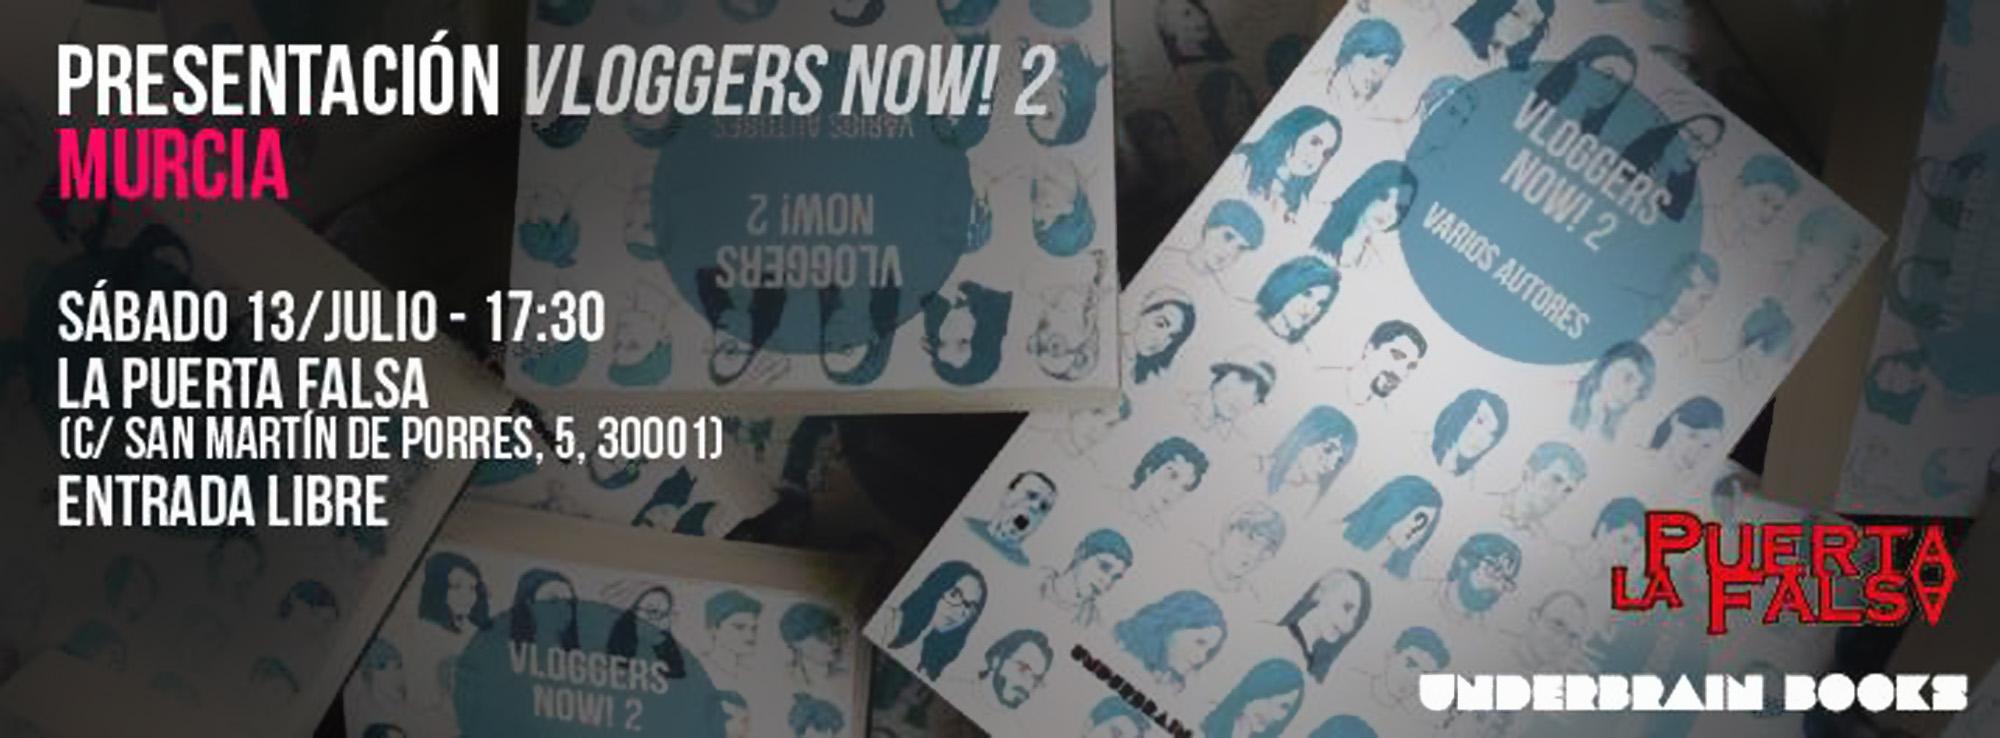 vloggersnow2